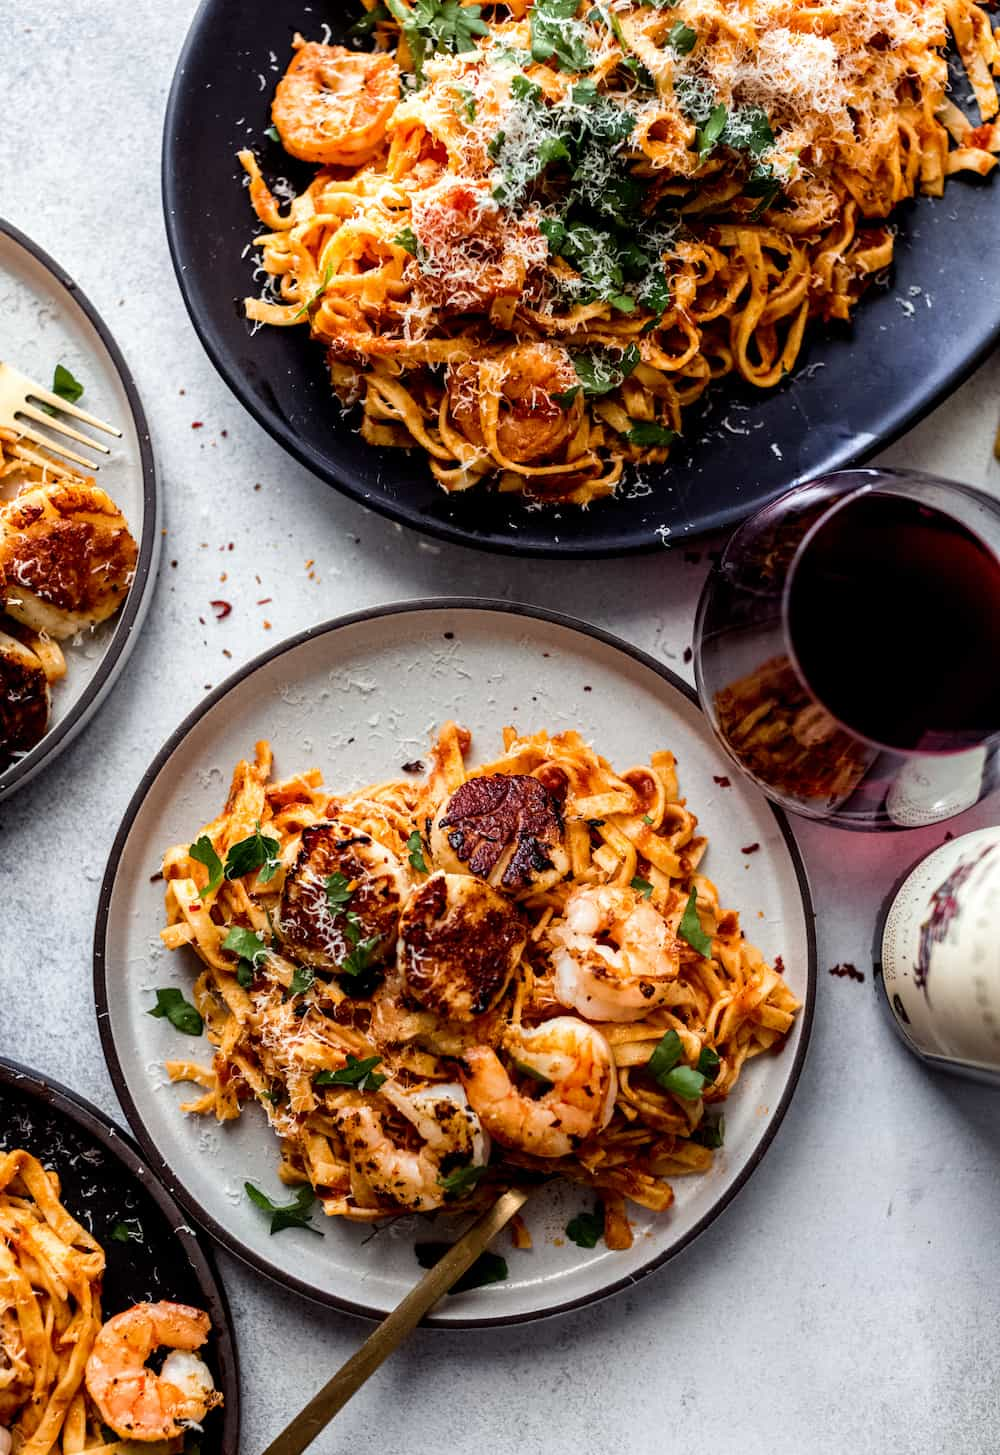 seafood pasta with arrabiata sauce diala's kitchen